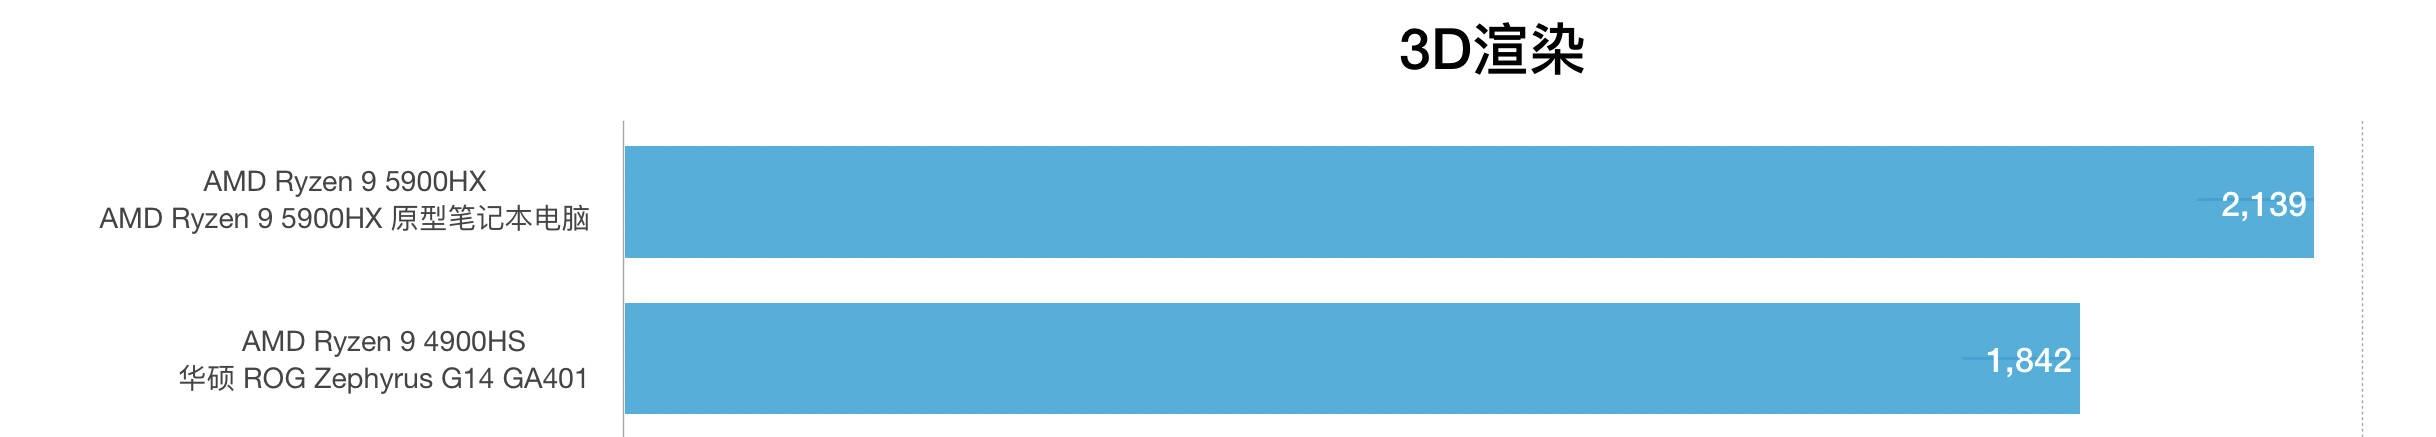 AMD锐龙R9 5900HX和R9 4900HS性能跑分对比评测